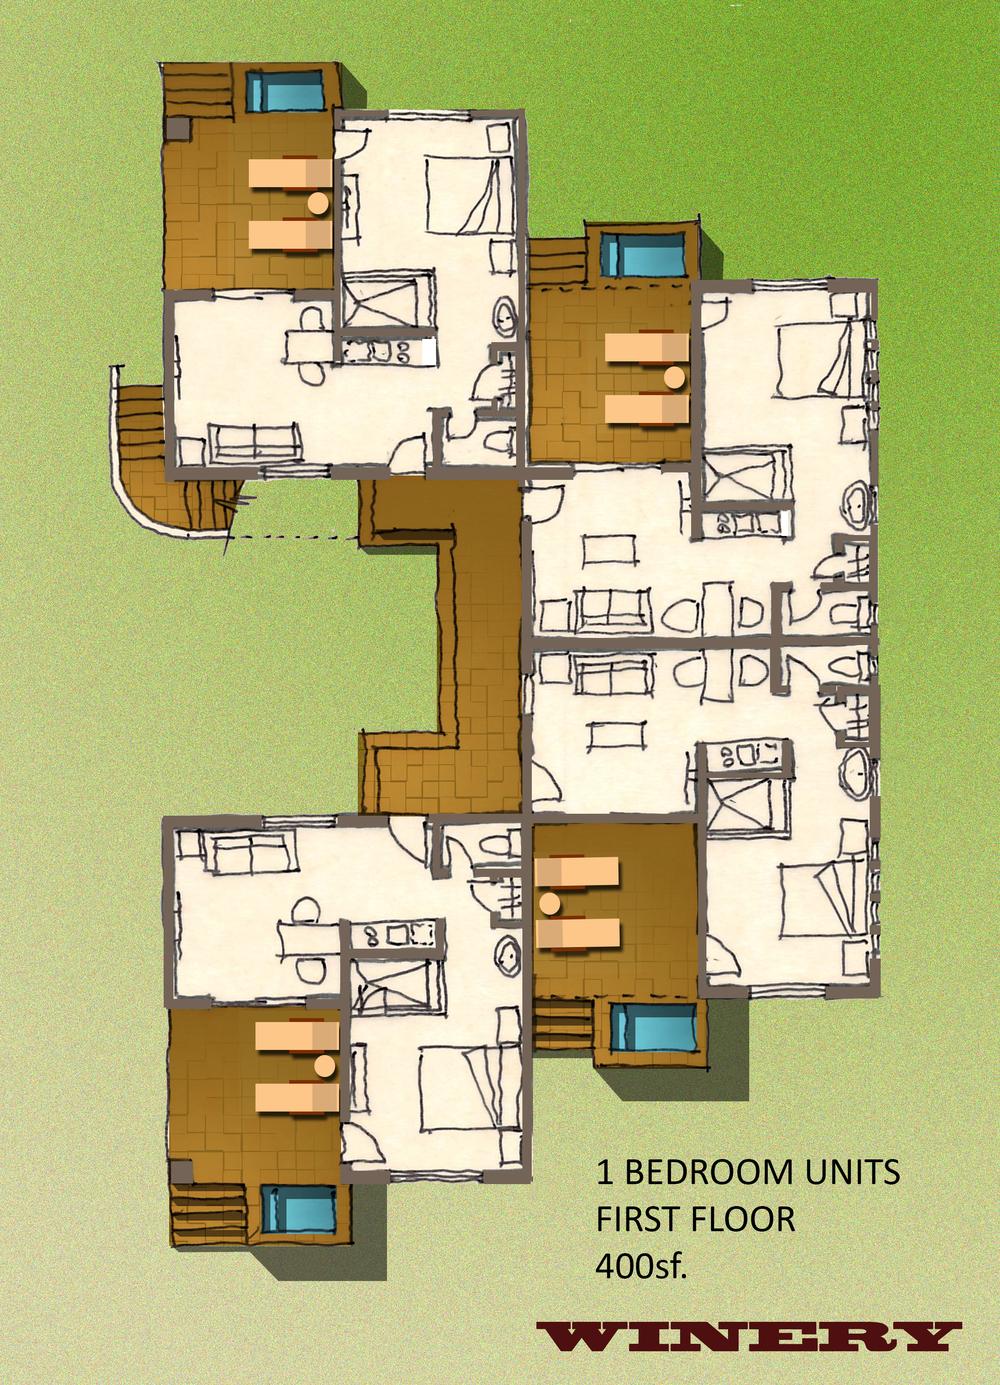 1 bedroom unit first floor.jpg